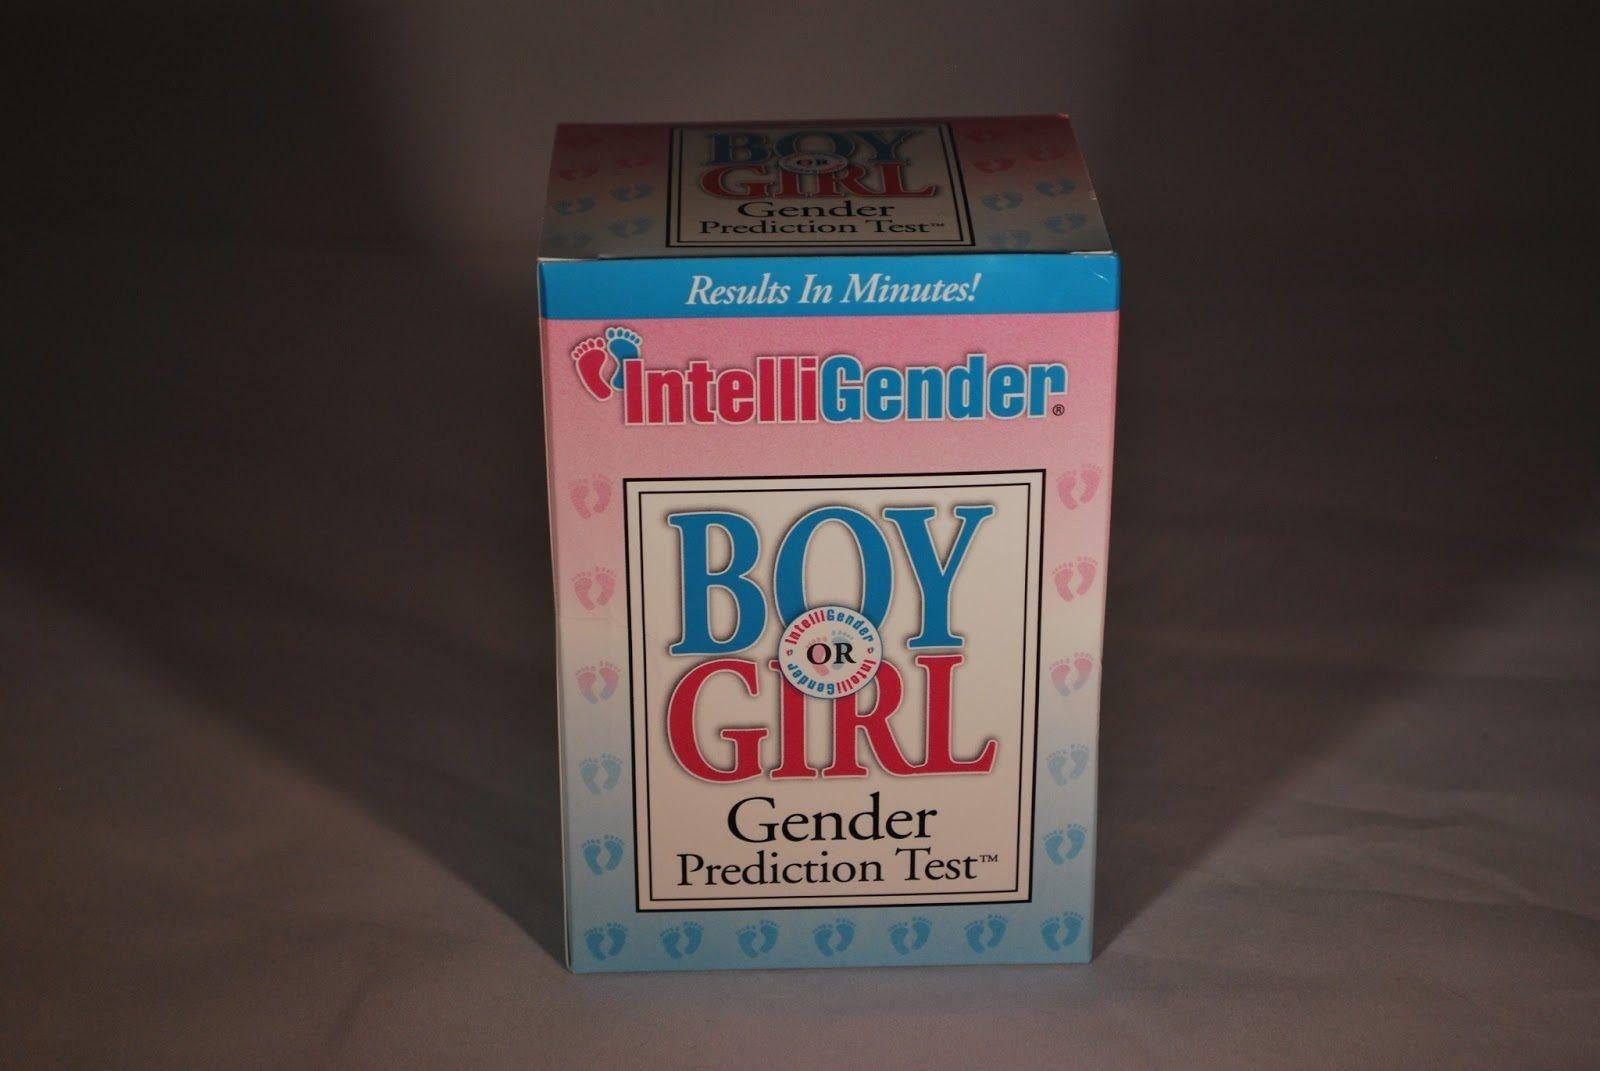 intelli studio_intelli gender 準嗎_intelli jidea